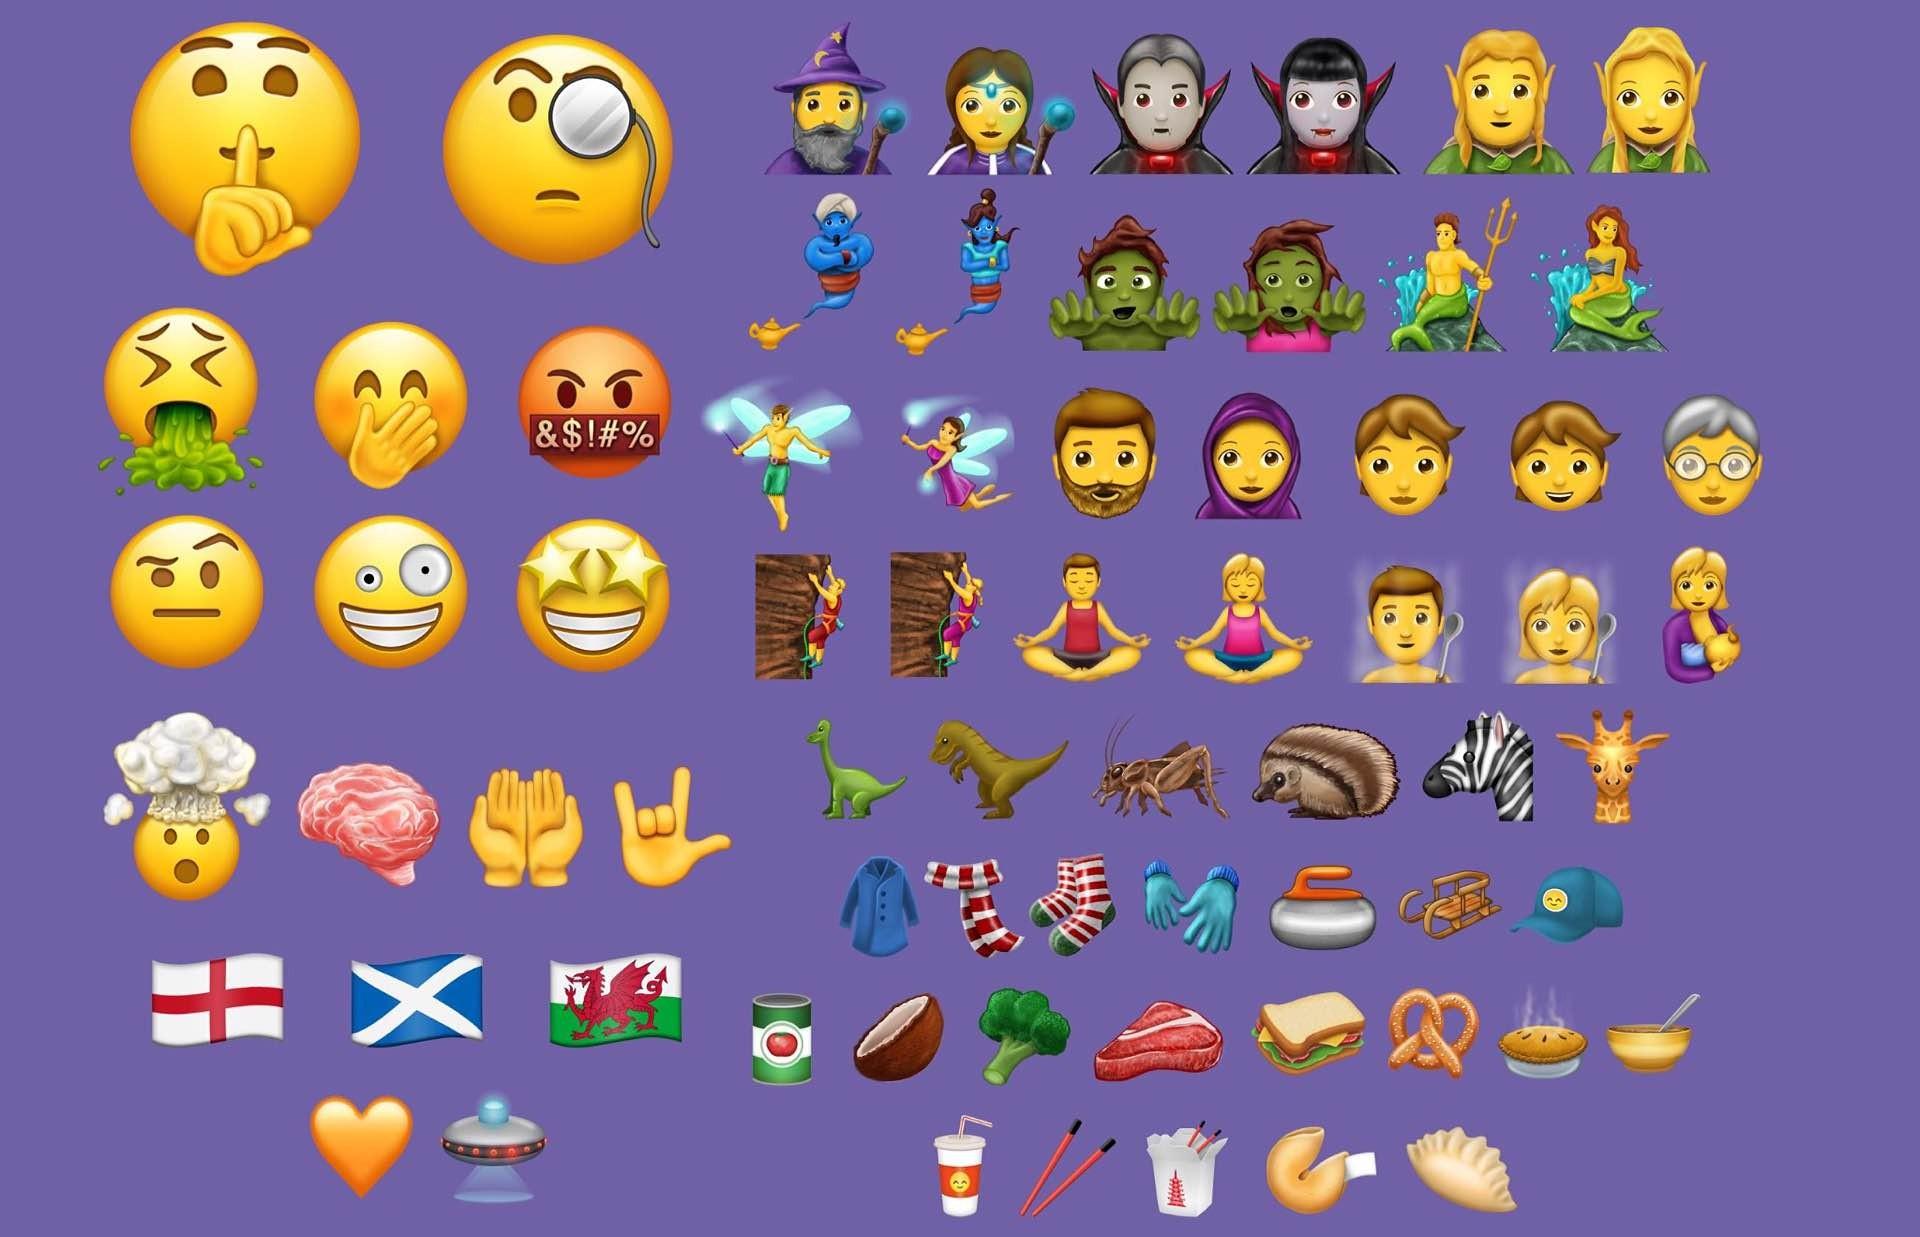 Image: Emojipedia